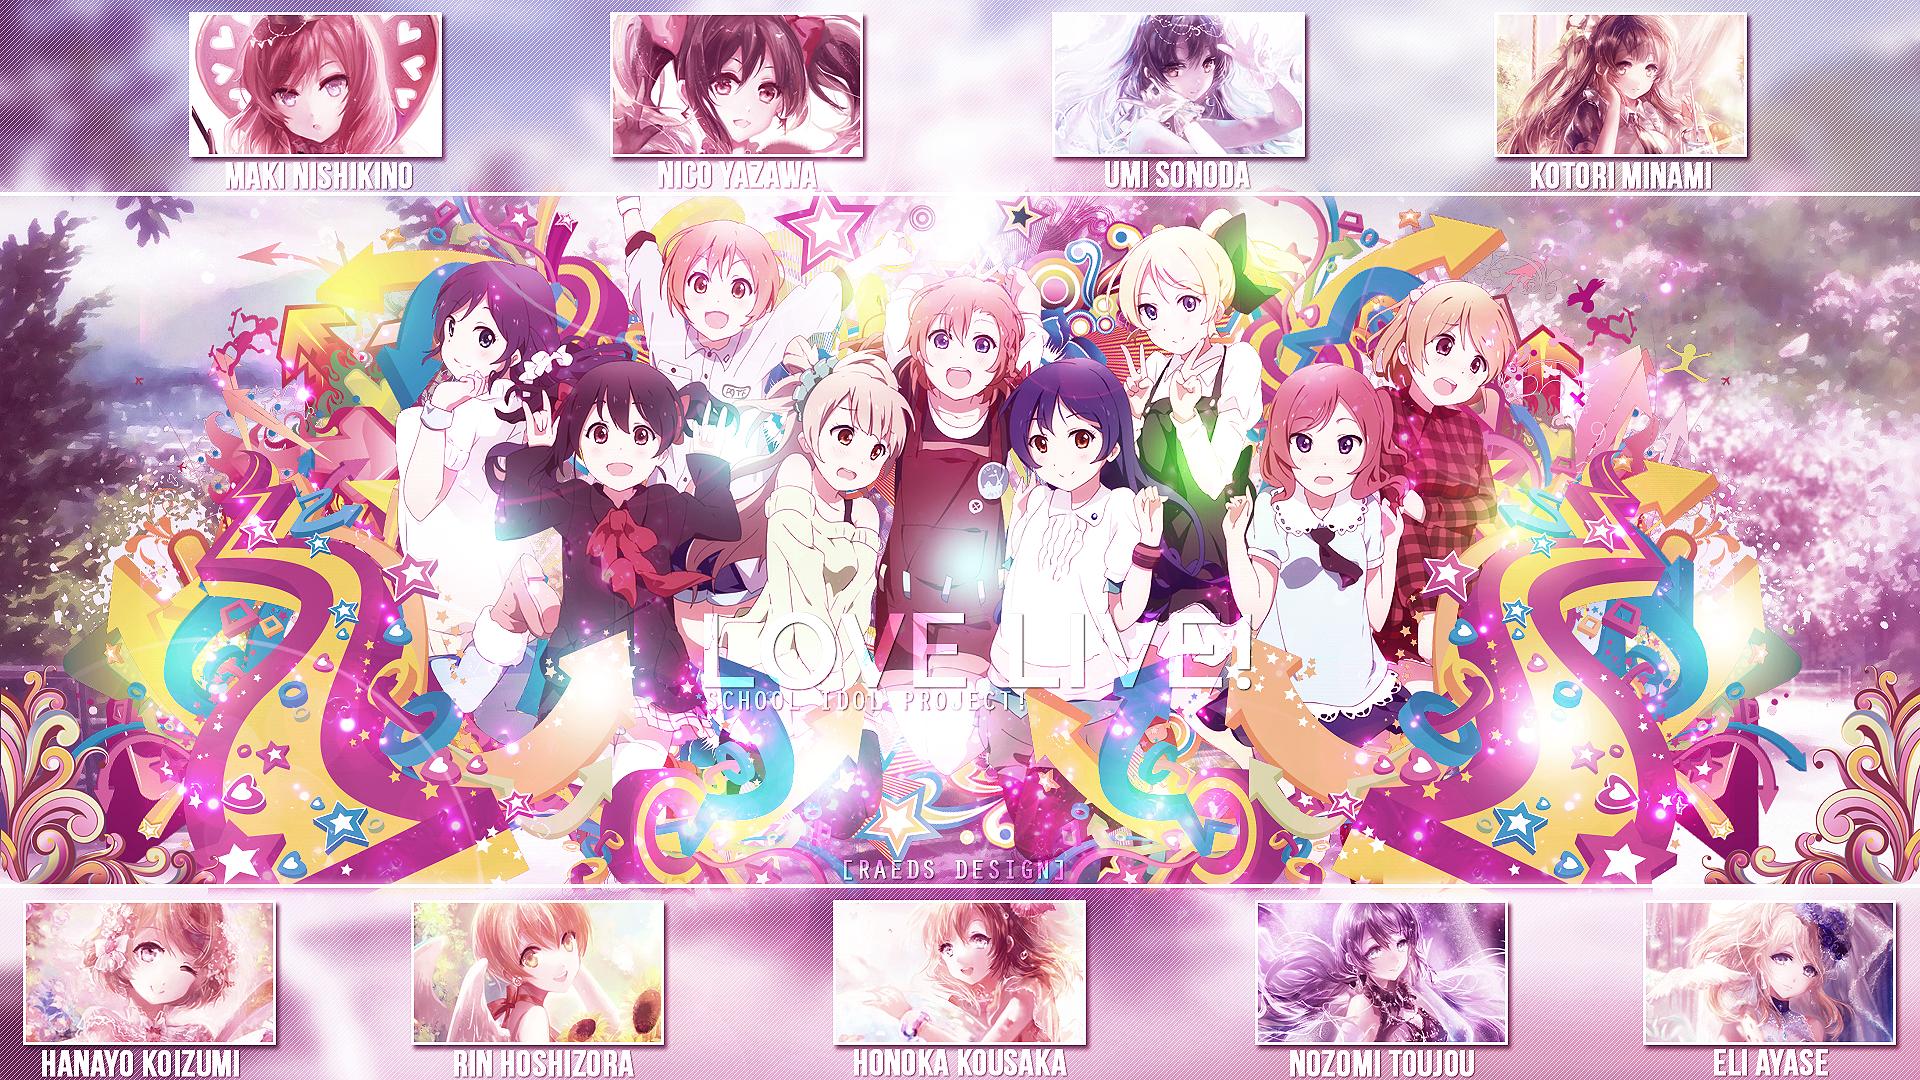 Love Live Wallpaper Hd New: Love Live! HD Wallpaper